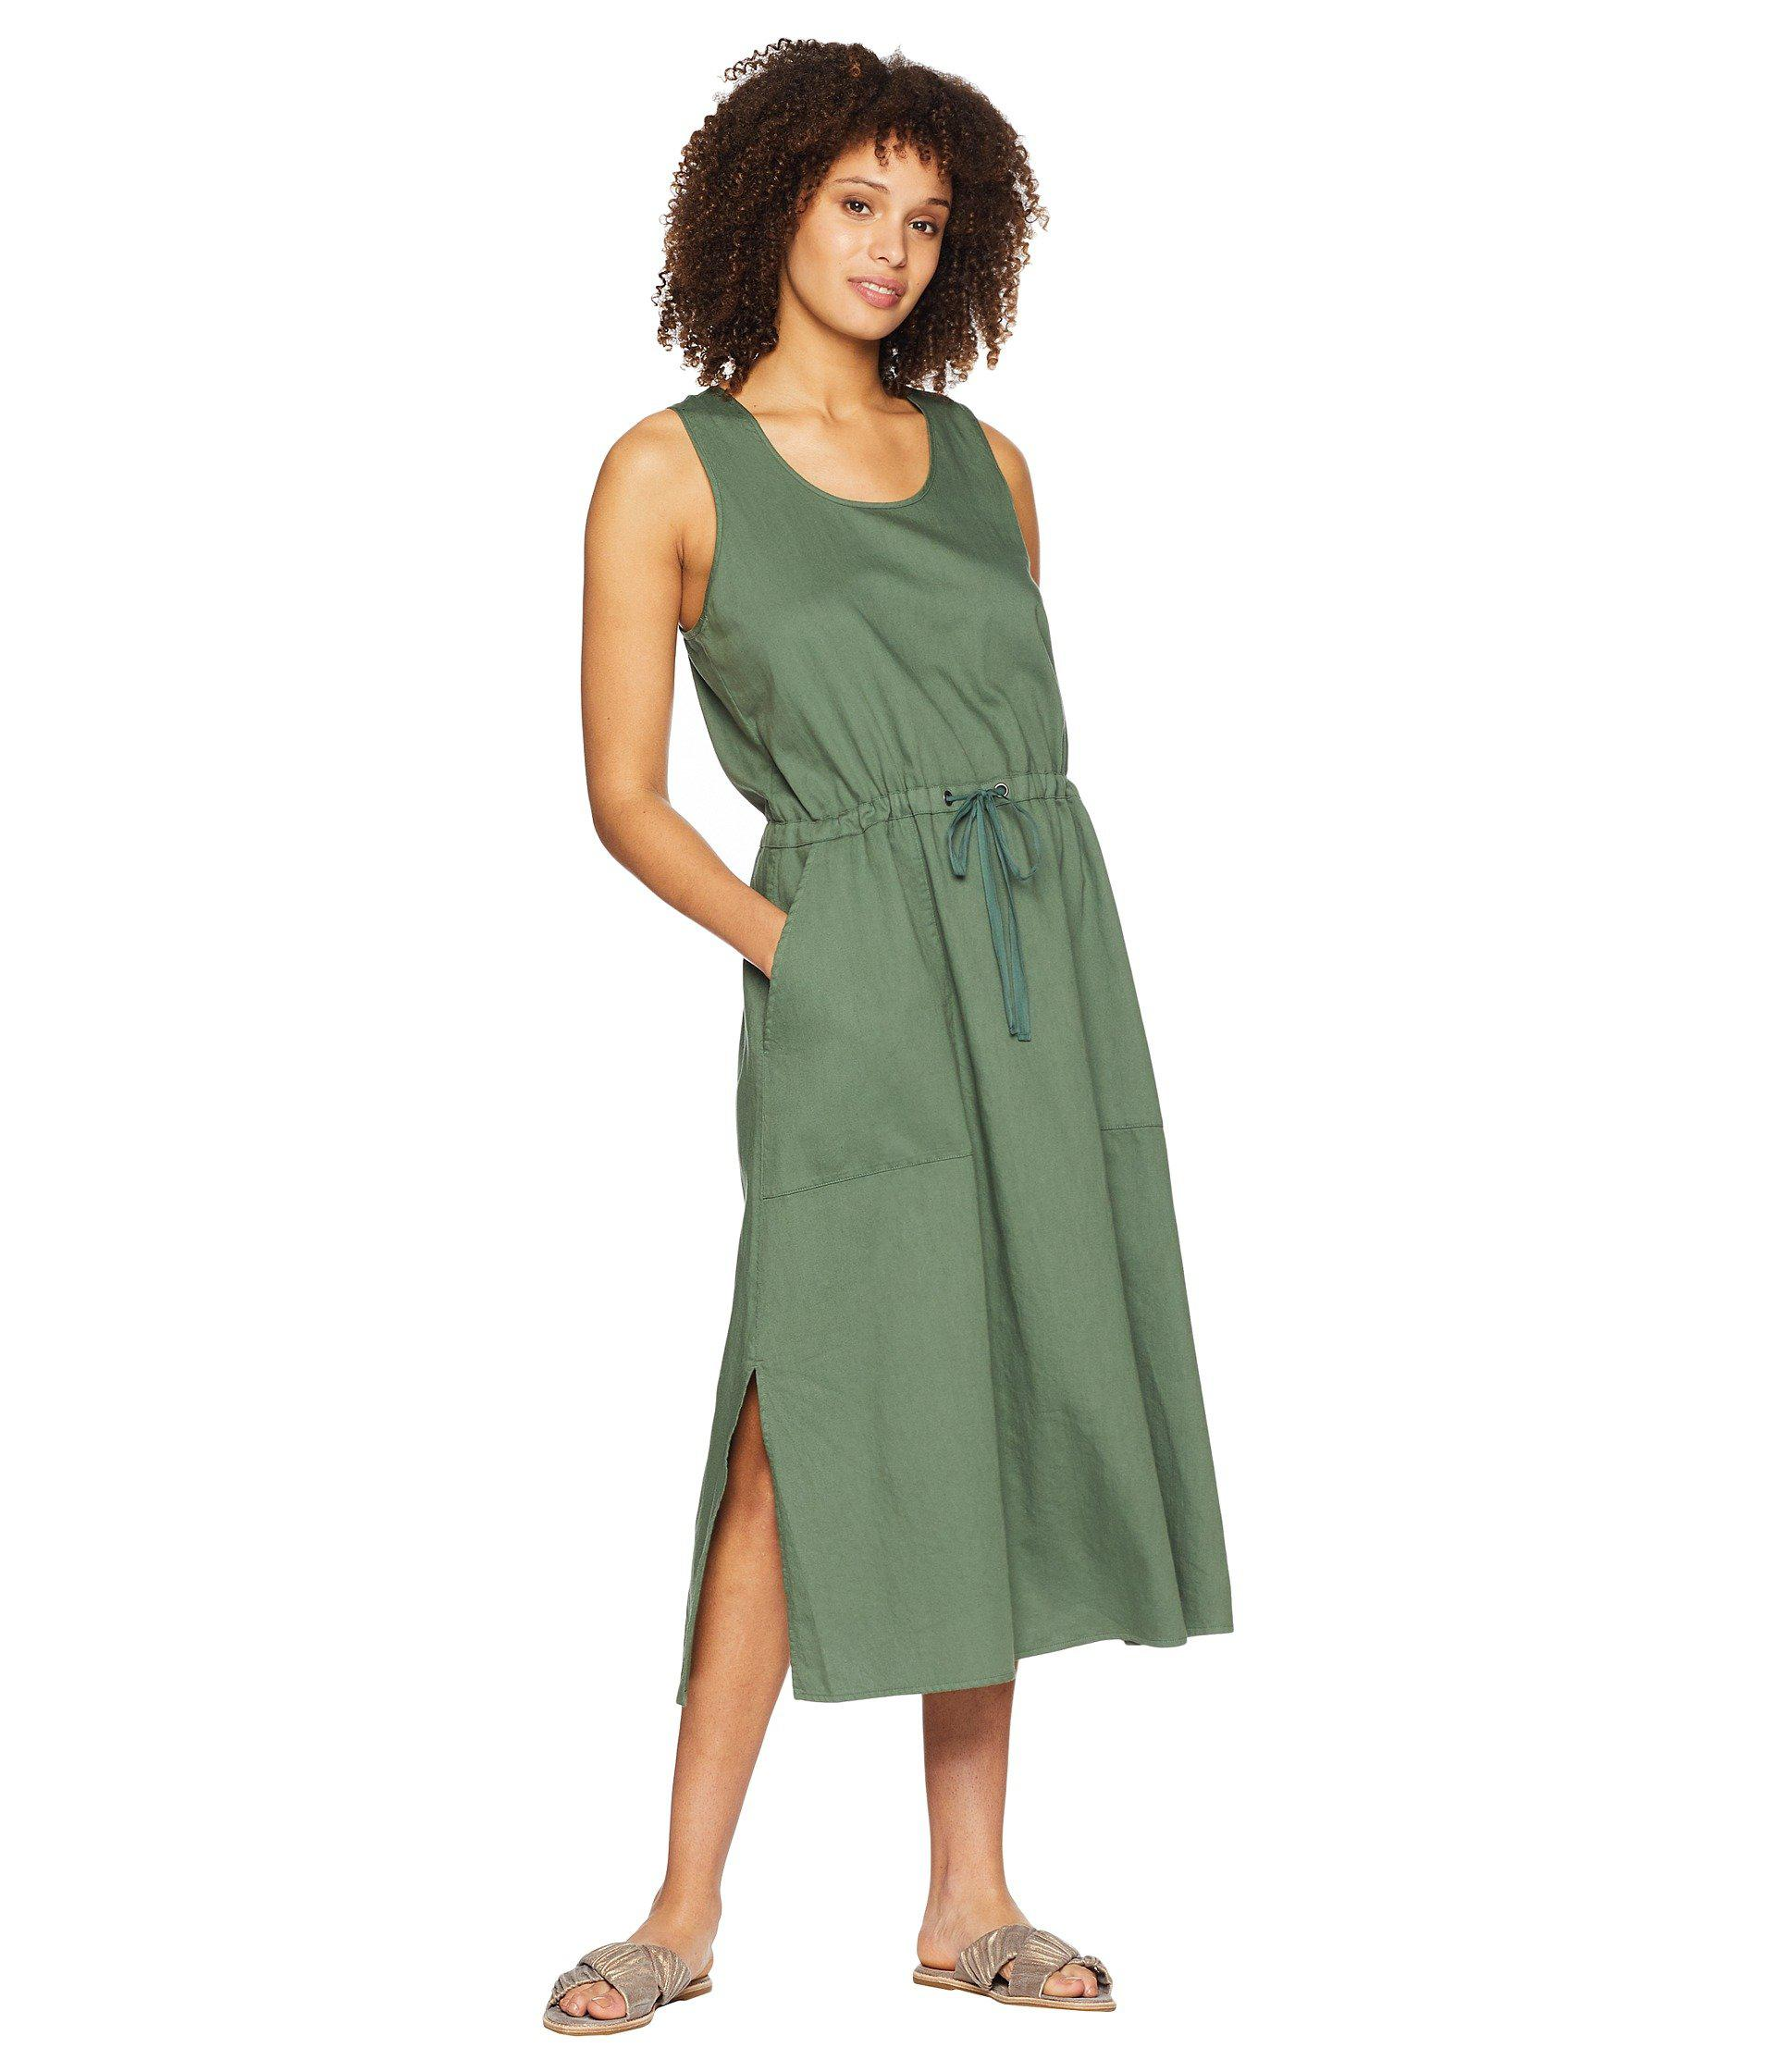 229847fff1fbd4 Eileen Fisher - Green Scoop Neck C l Dress - Lyst. View fullscreen